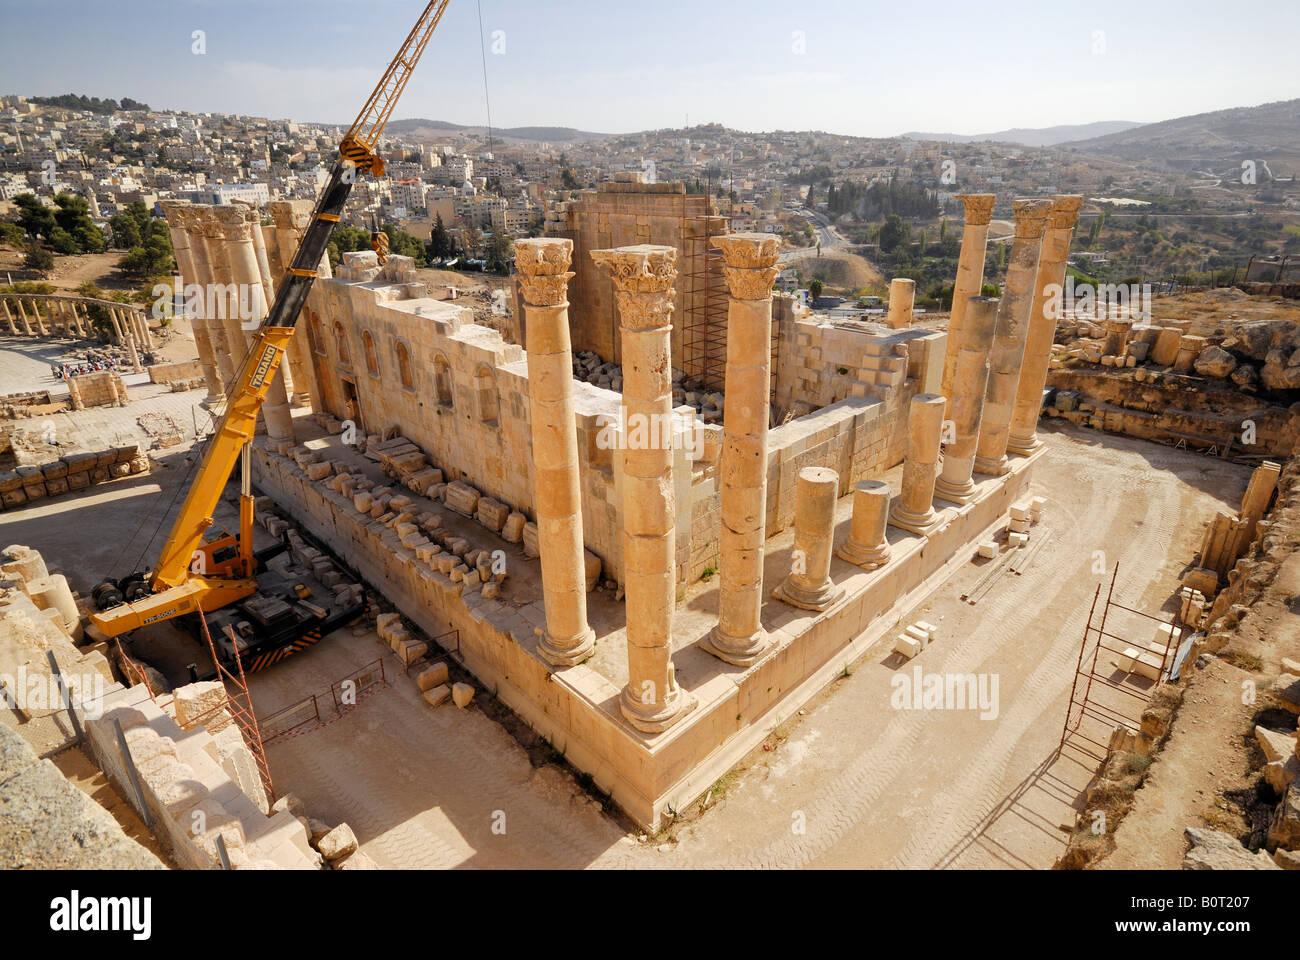 Temple of Zeus with 15 m high Corinthian columns Ruins of Jerash Roman Decapolis city dating from 39 to 76 AD Jordan - Stock Image